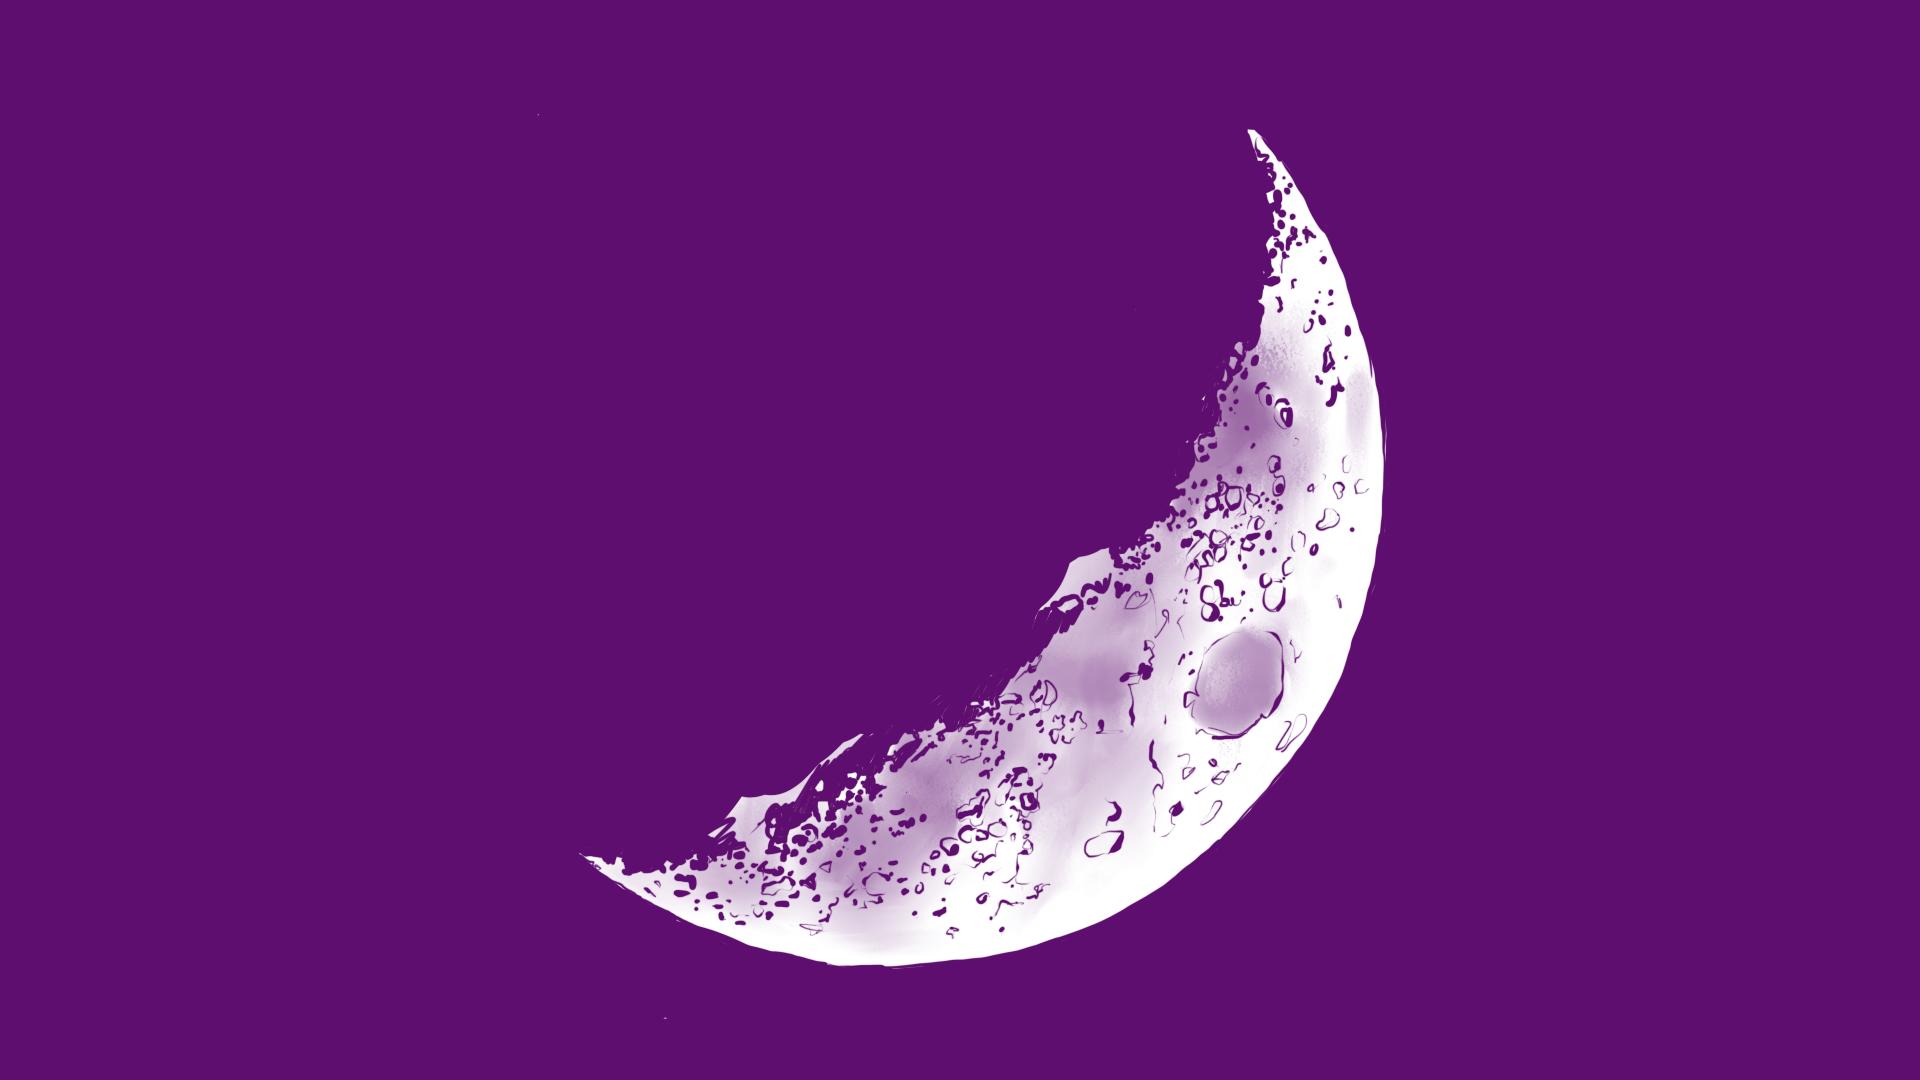 Den Mond verschlucken